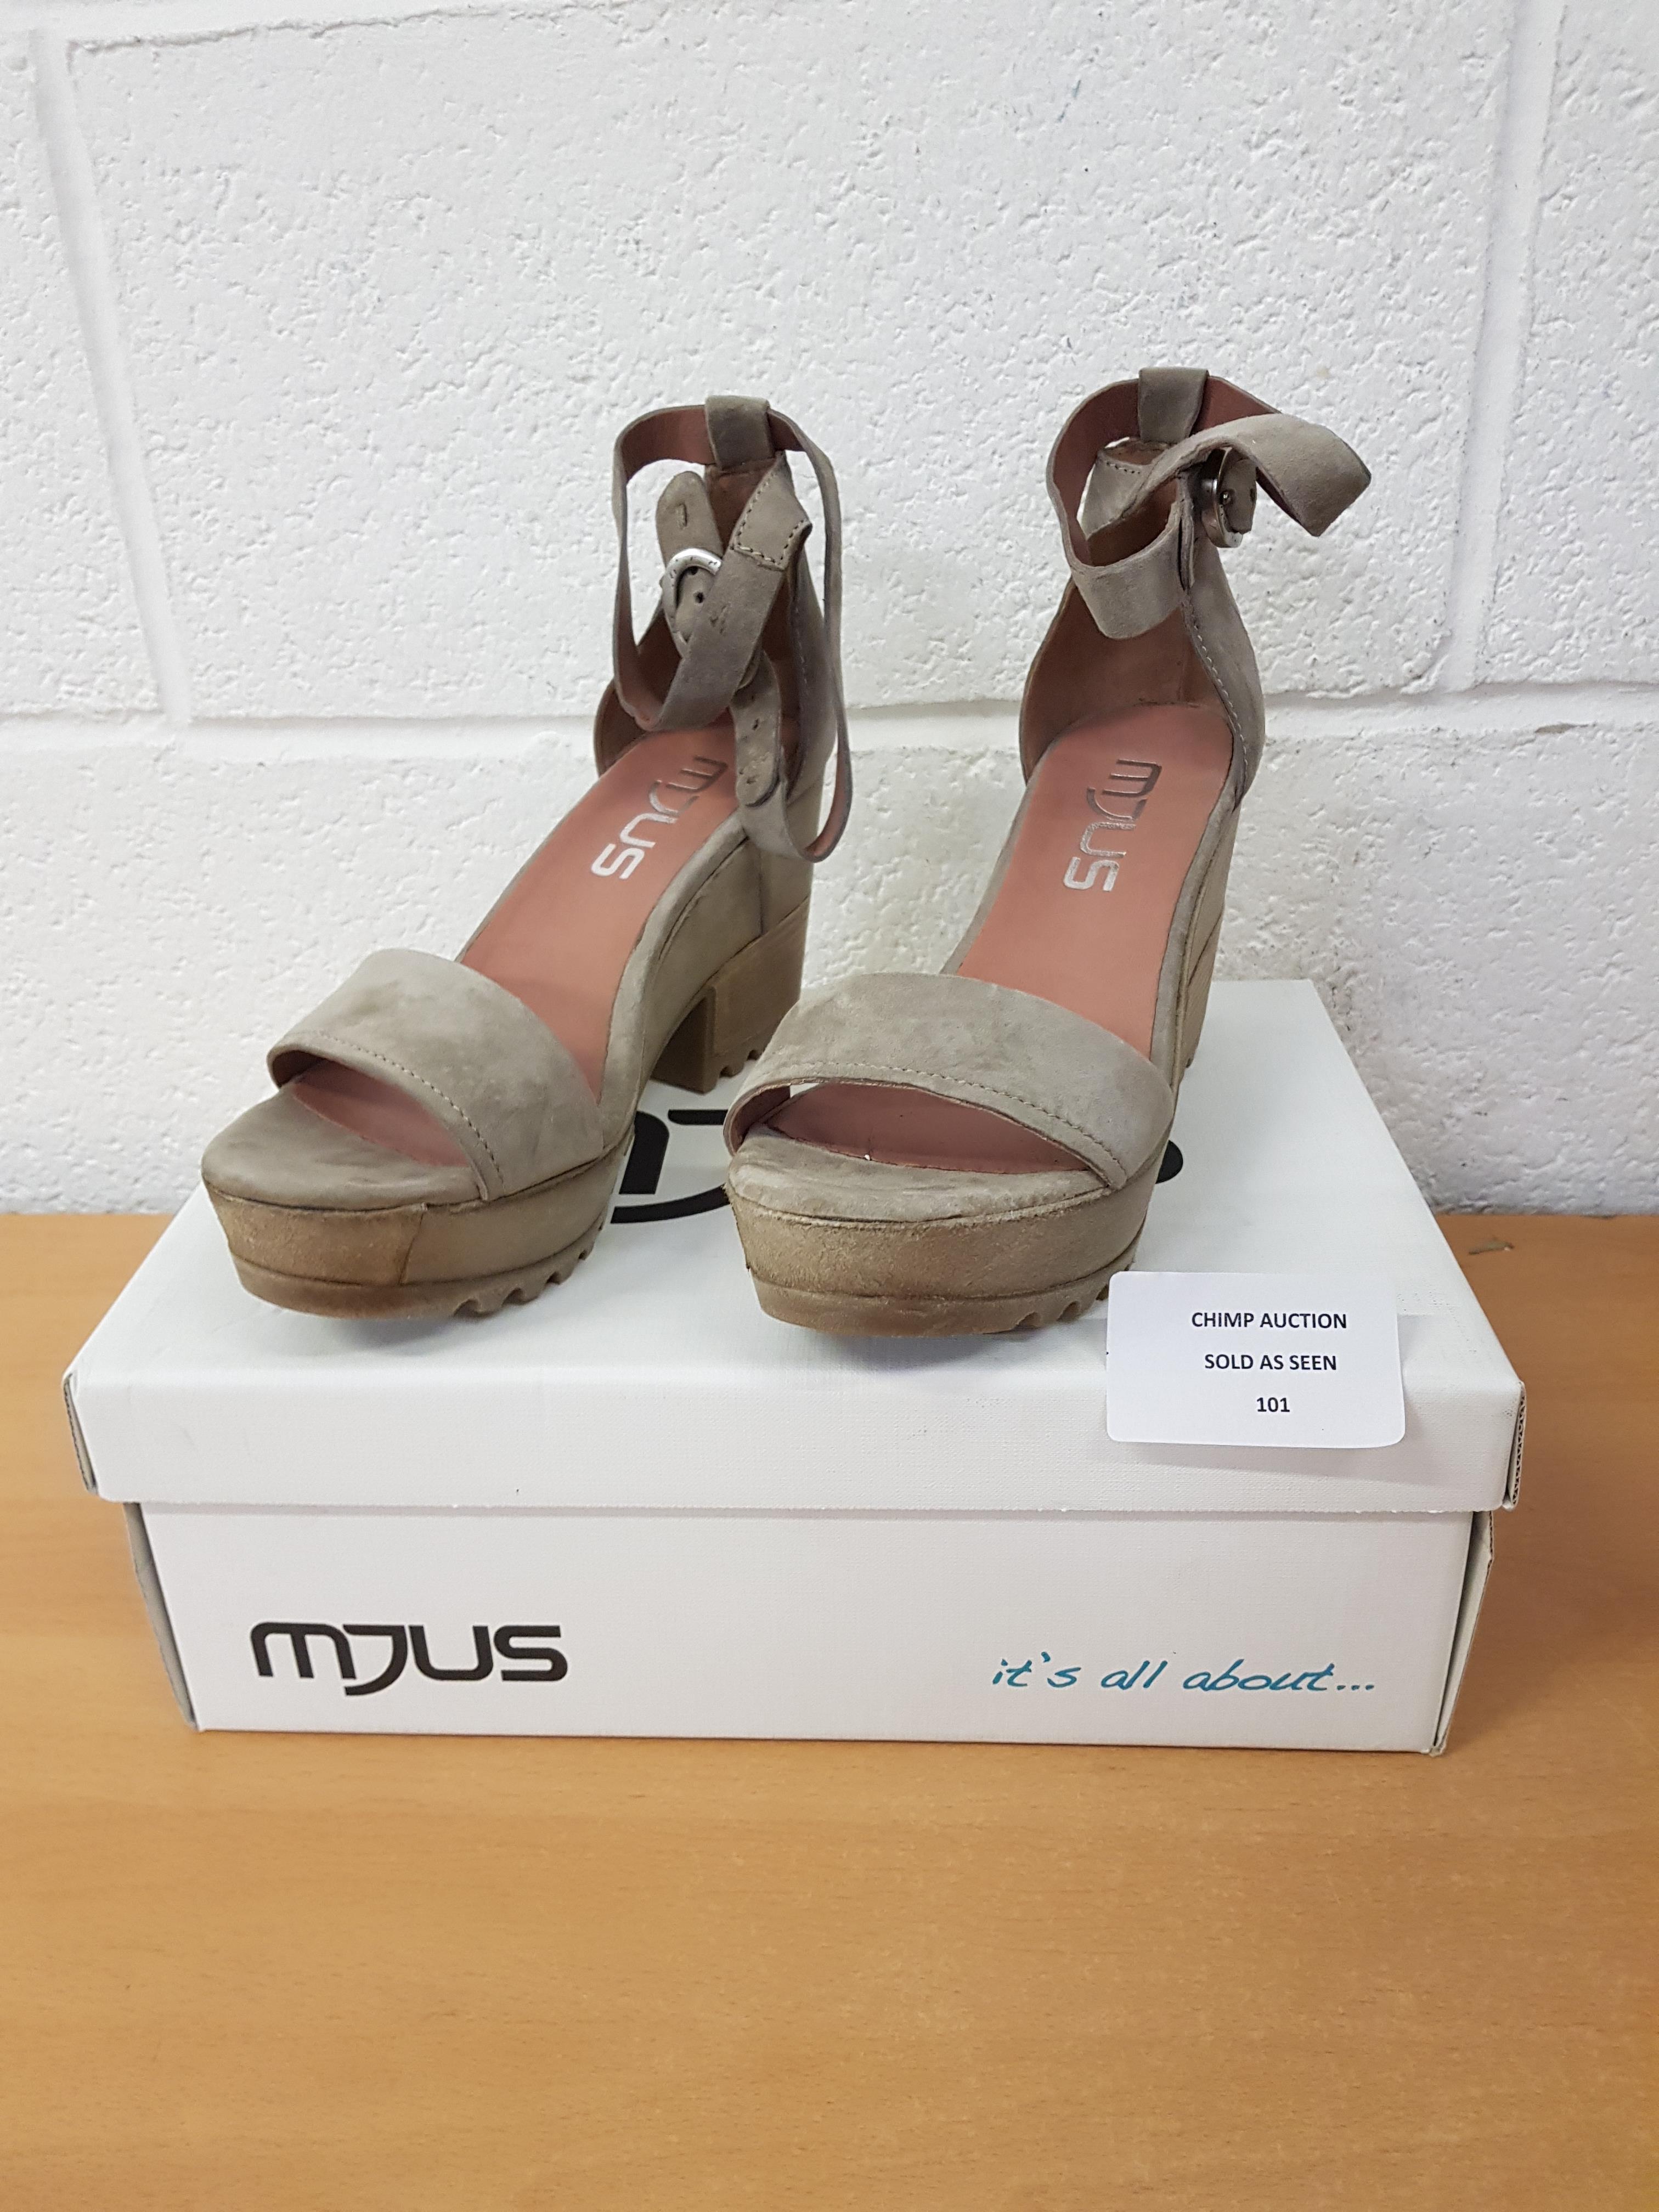 Lot 101 - Mjus ladies sandals EU 40